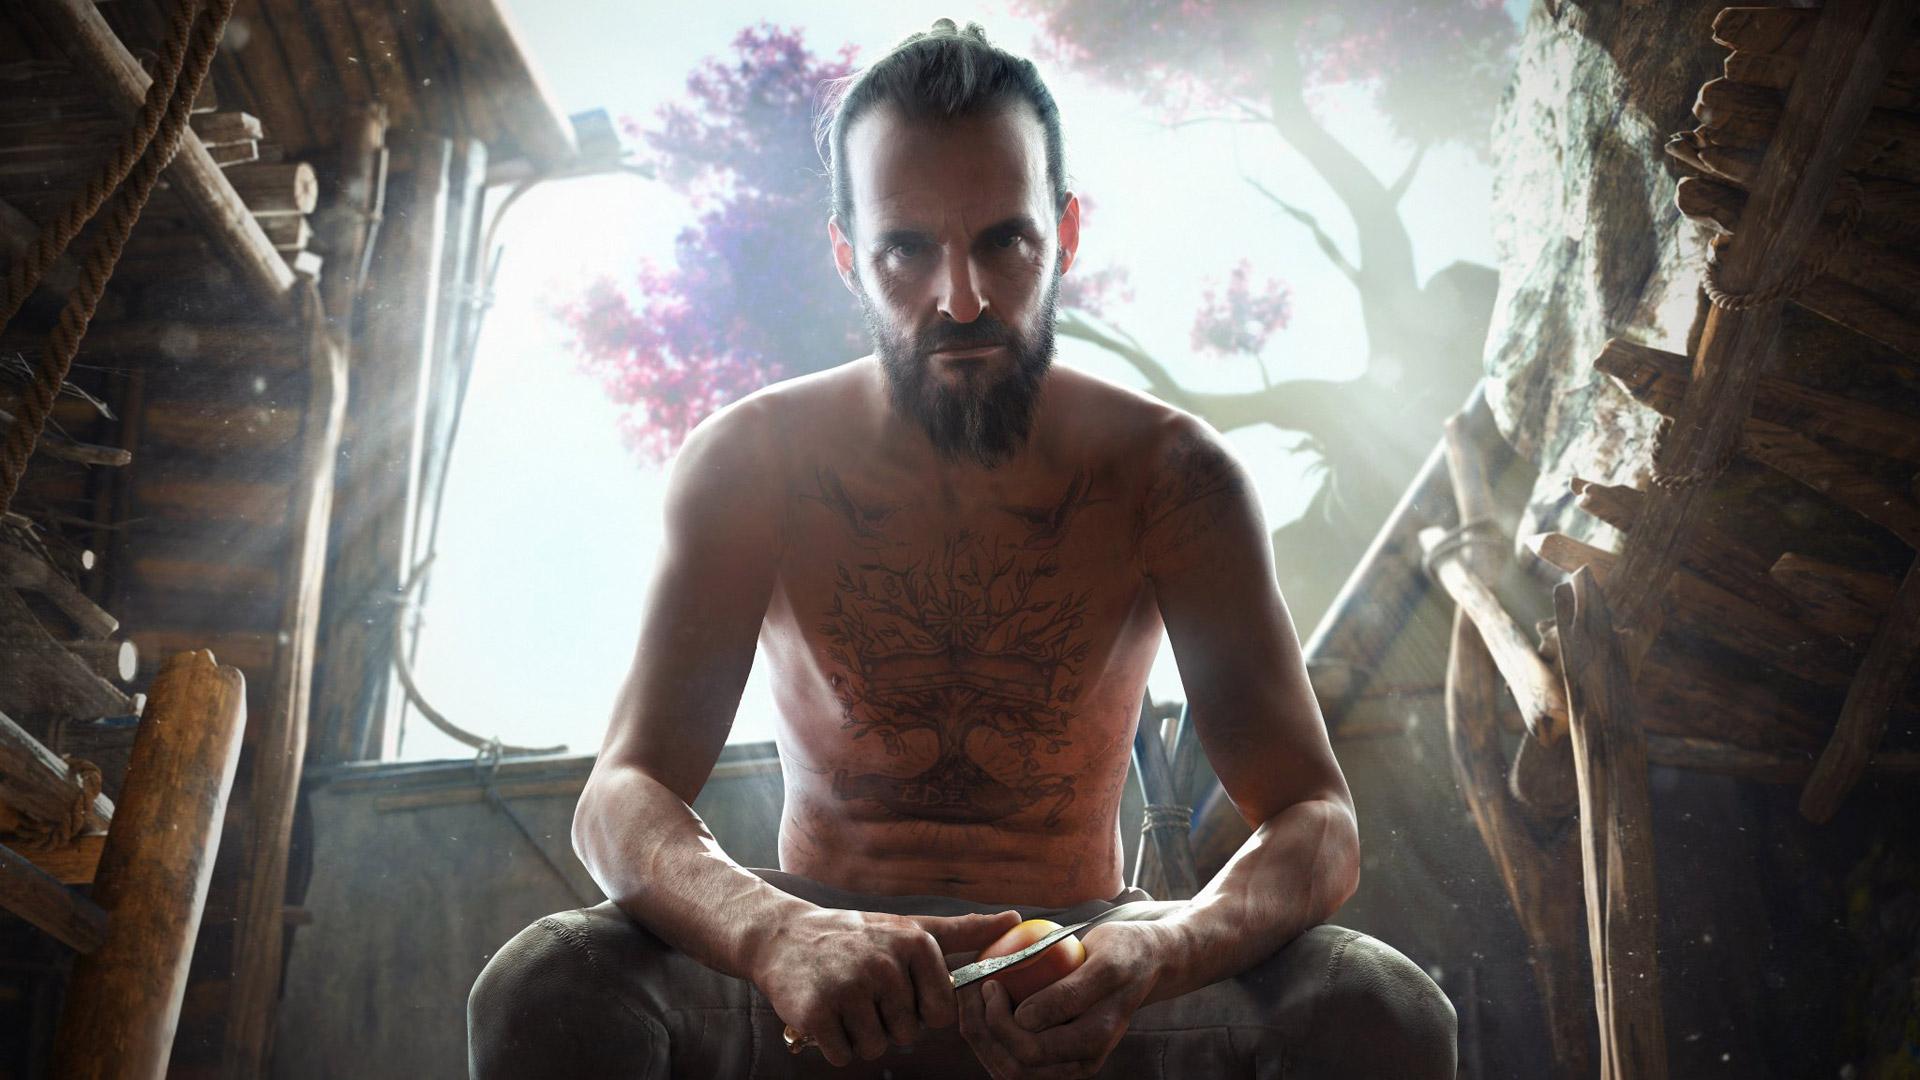 Far Cry: New Dawn Wallpaper in 1920x1080